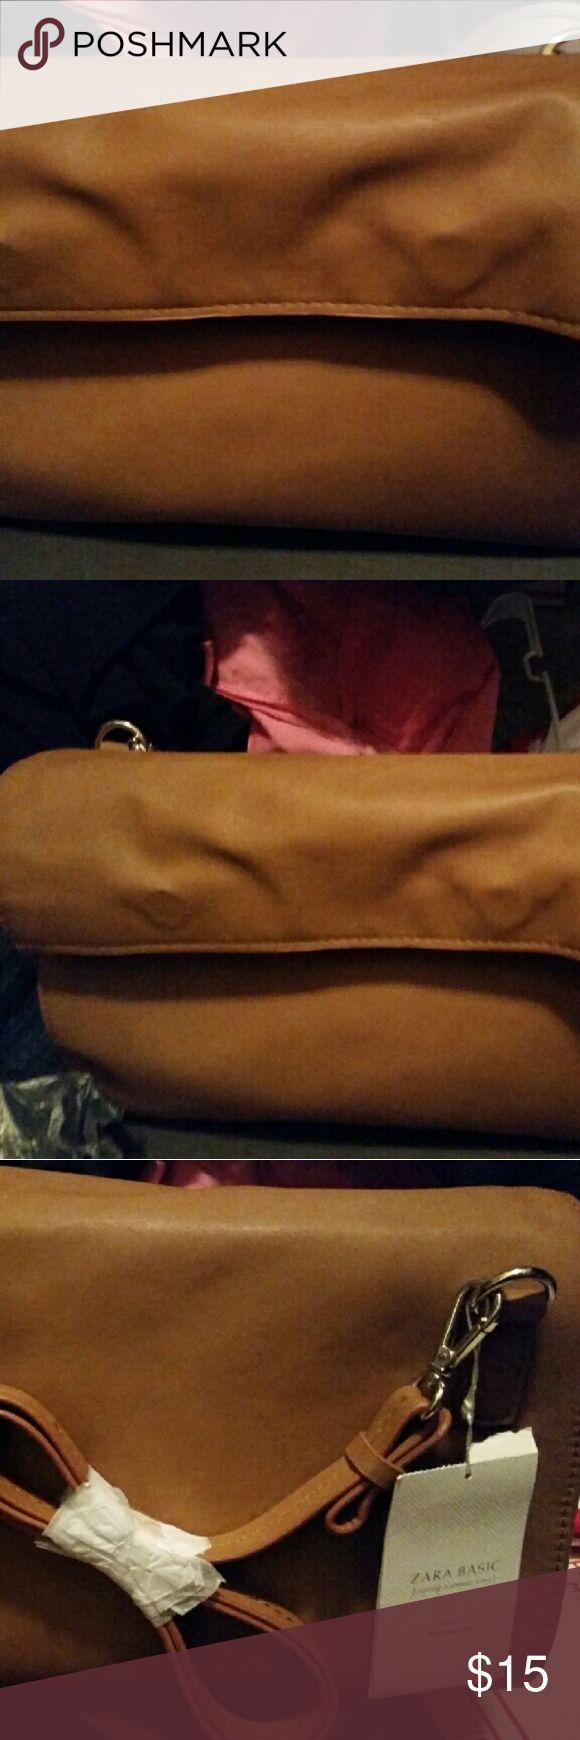 Zara NWT brown messenger bag w strap Zara bag, brand new Zara Bags Shoulder Bags